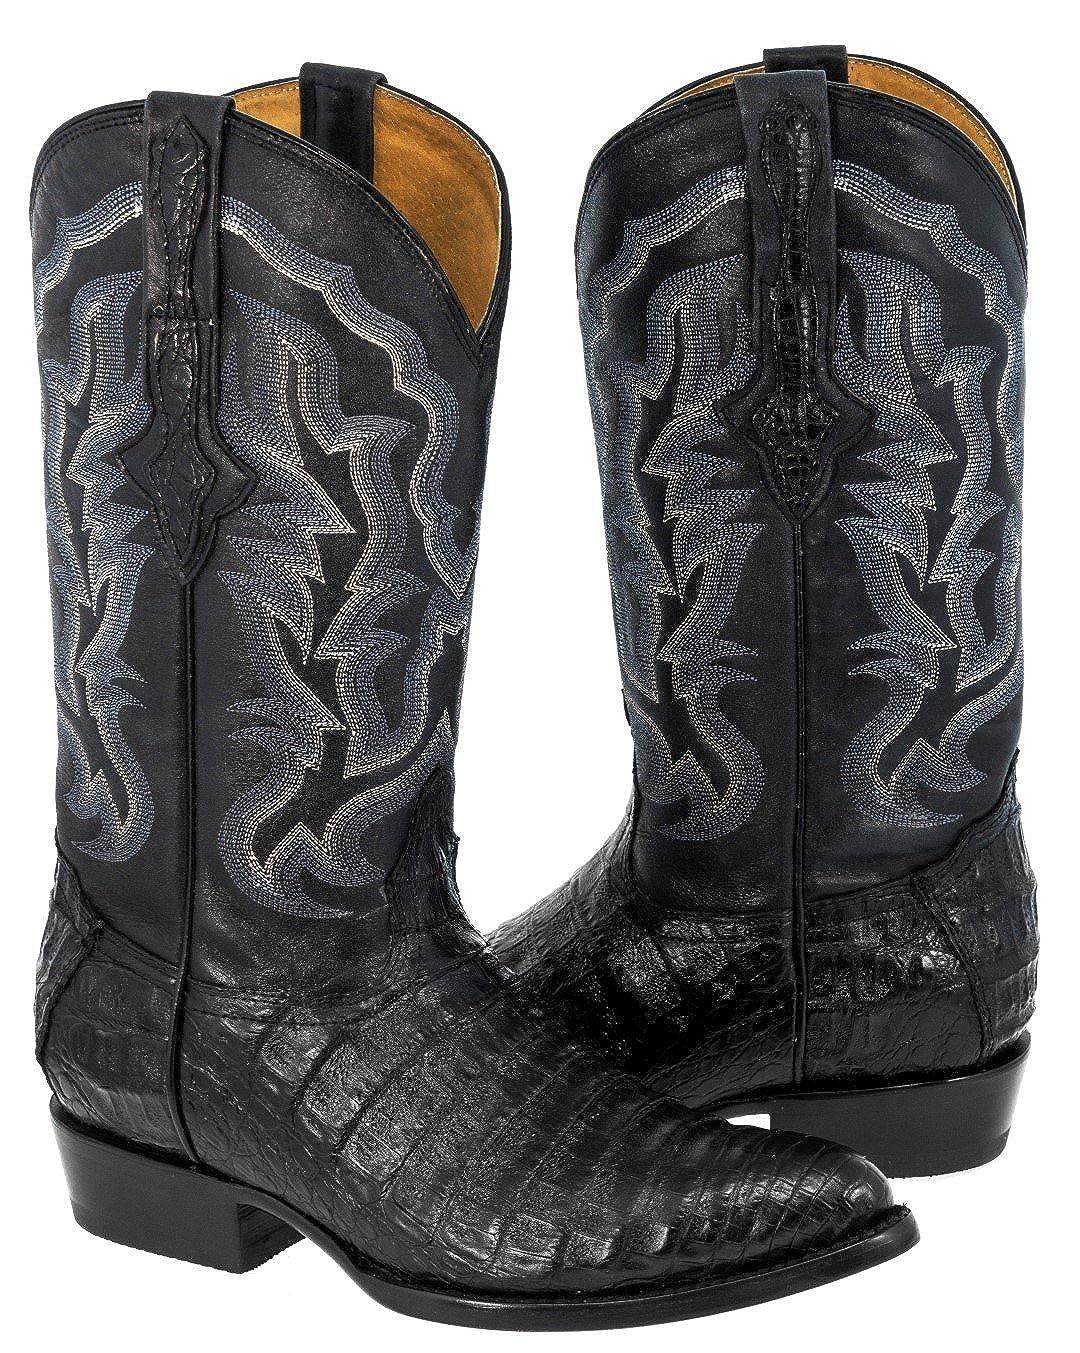 Cowboy Professional Mens Crocodile Belly Skin Leather Western Cowboy Boots J Toe